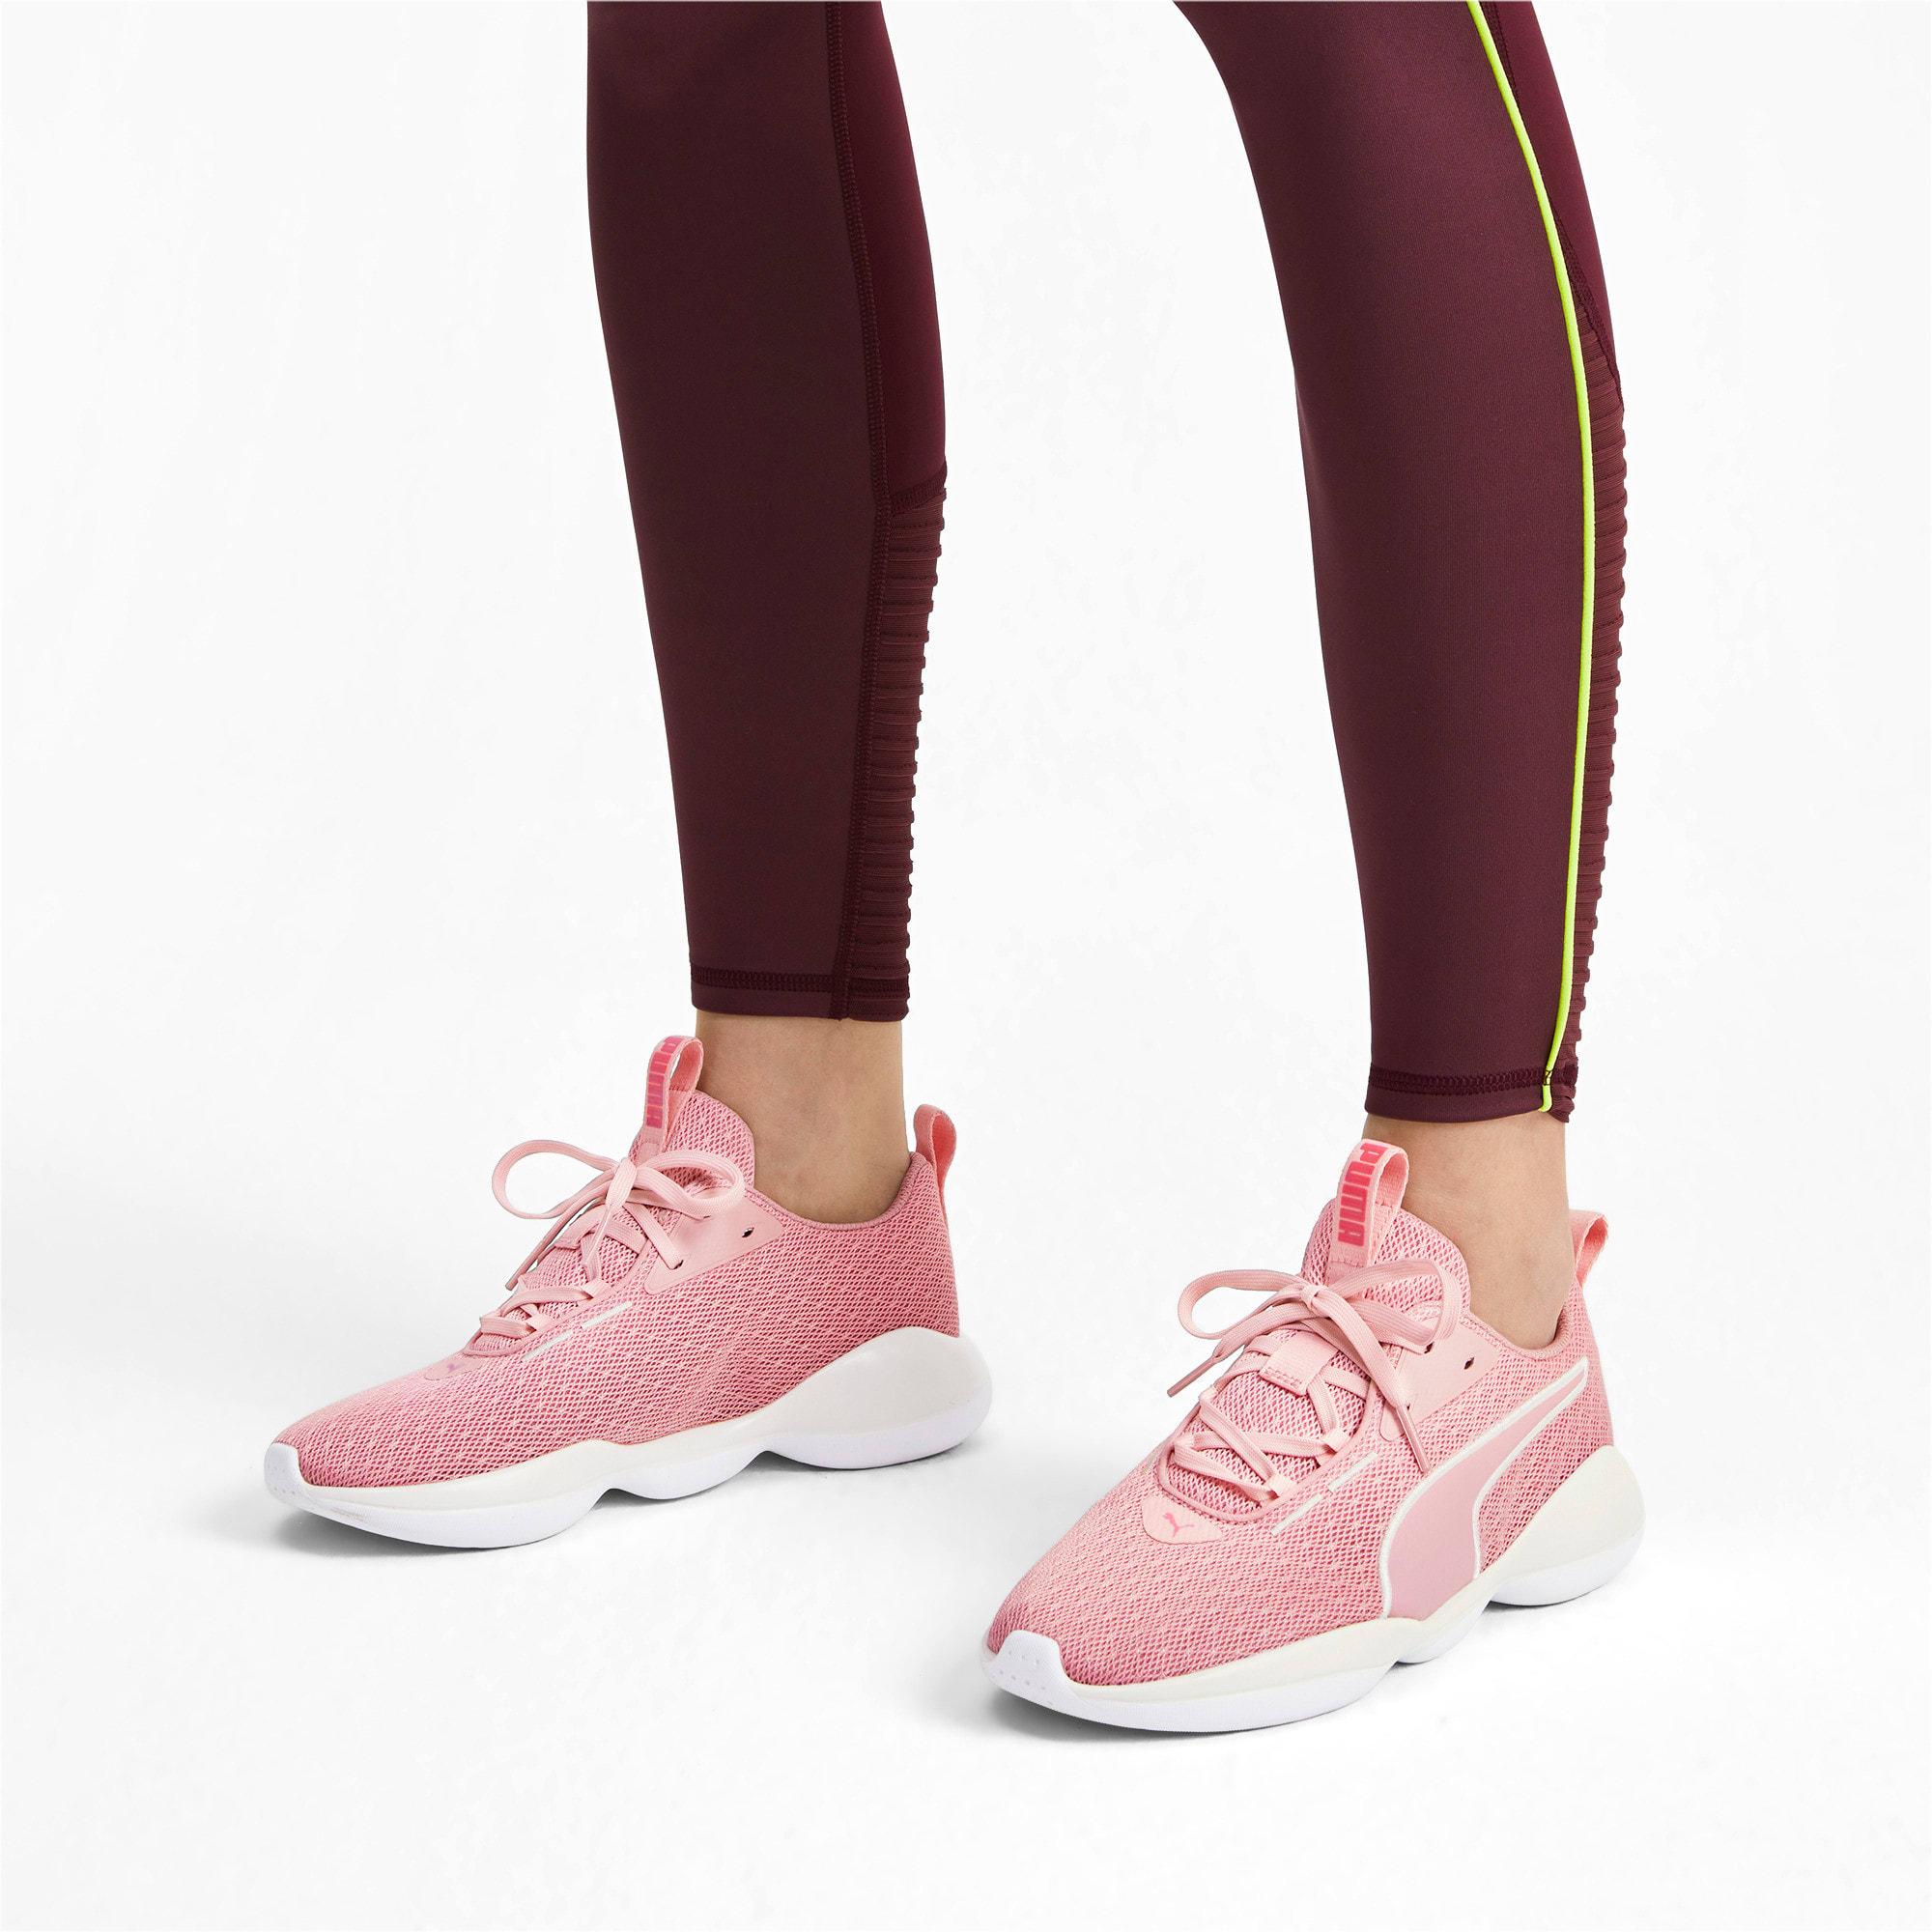 Thumbnail 3 of Flourish FS Women's Running Shoes, Bridal Rose-Puma White, medium-IND